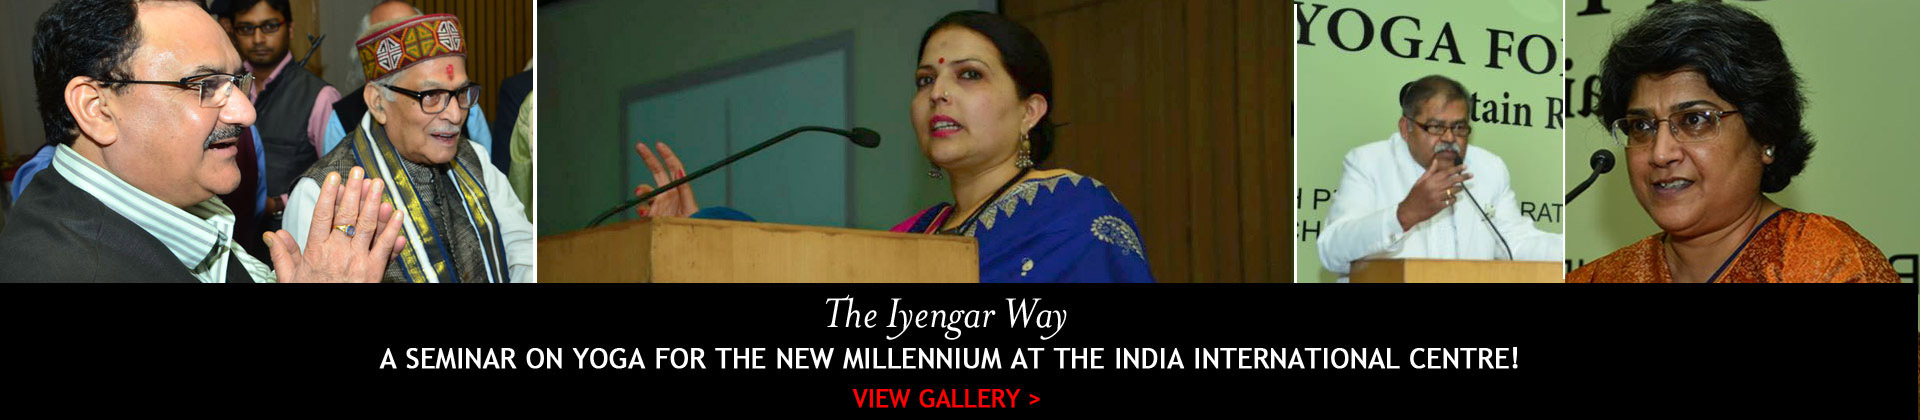 IYENGAR YOGA CENTRE YOGAKSHEMA Delhi NCR S Only Accredited Iyengar